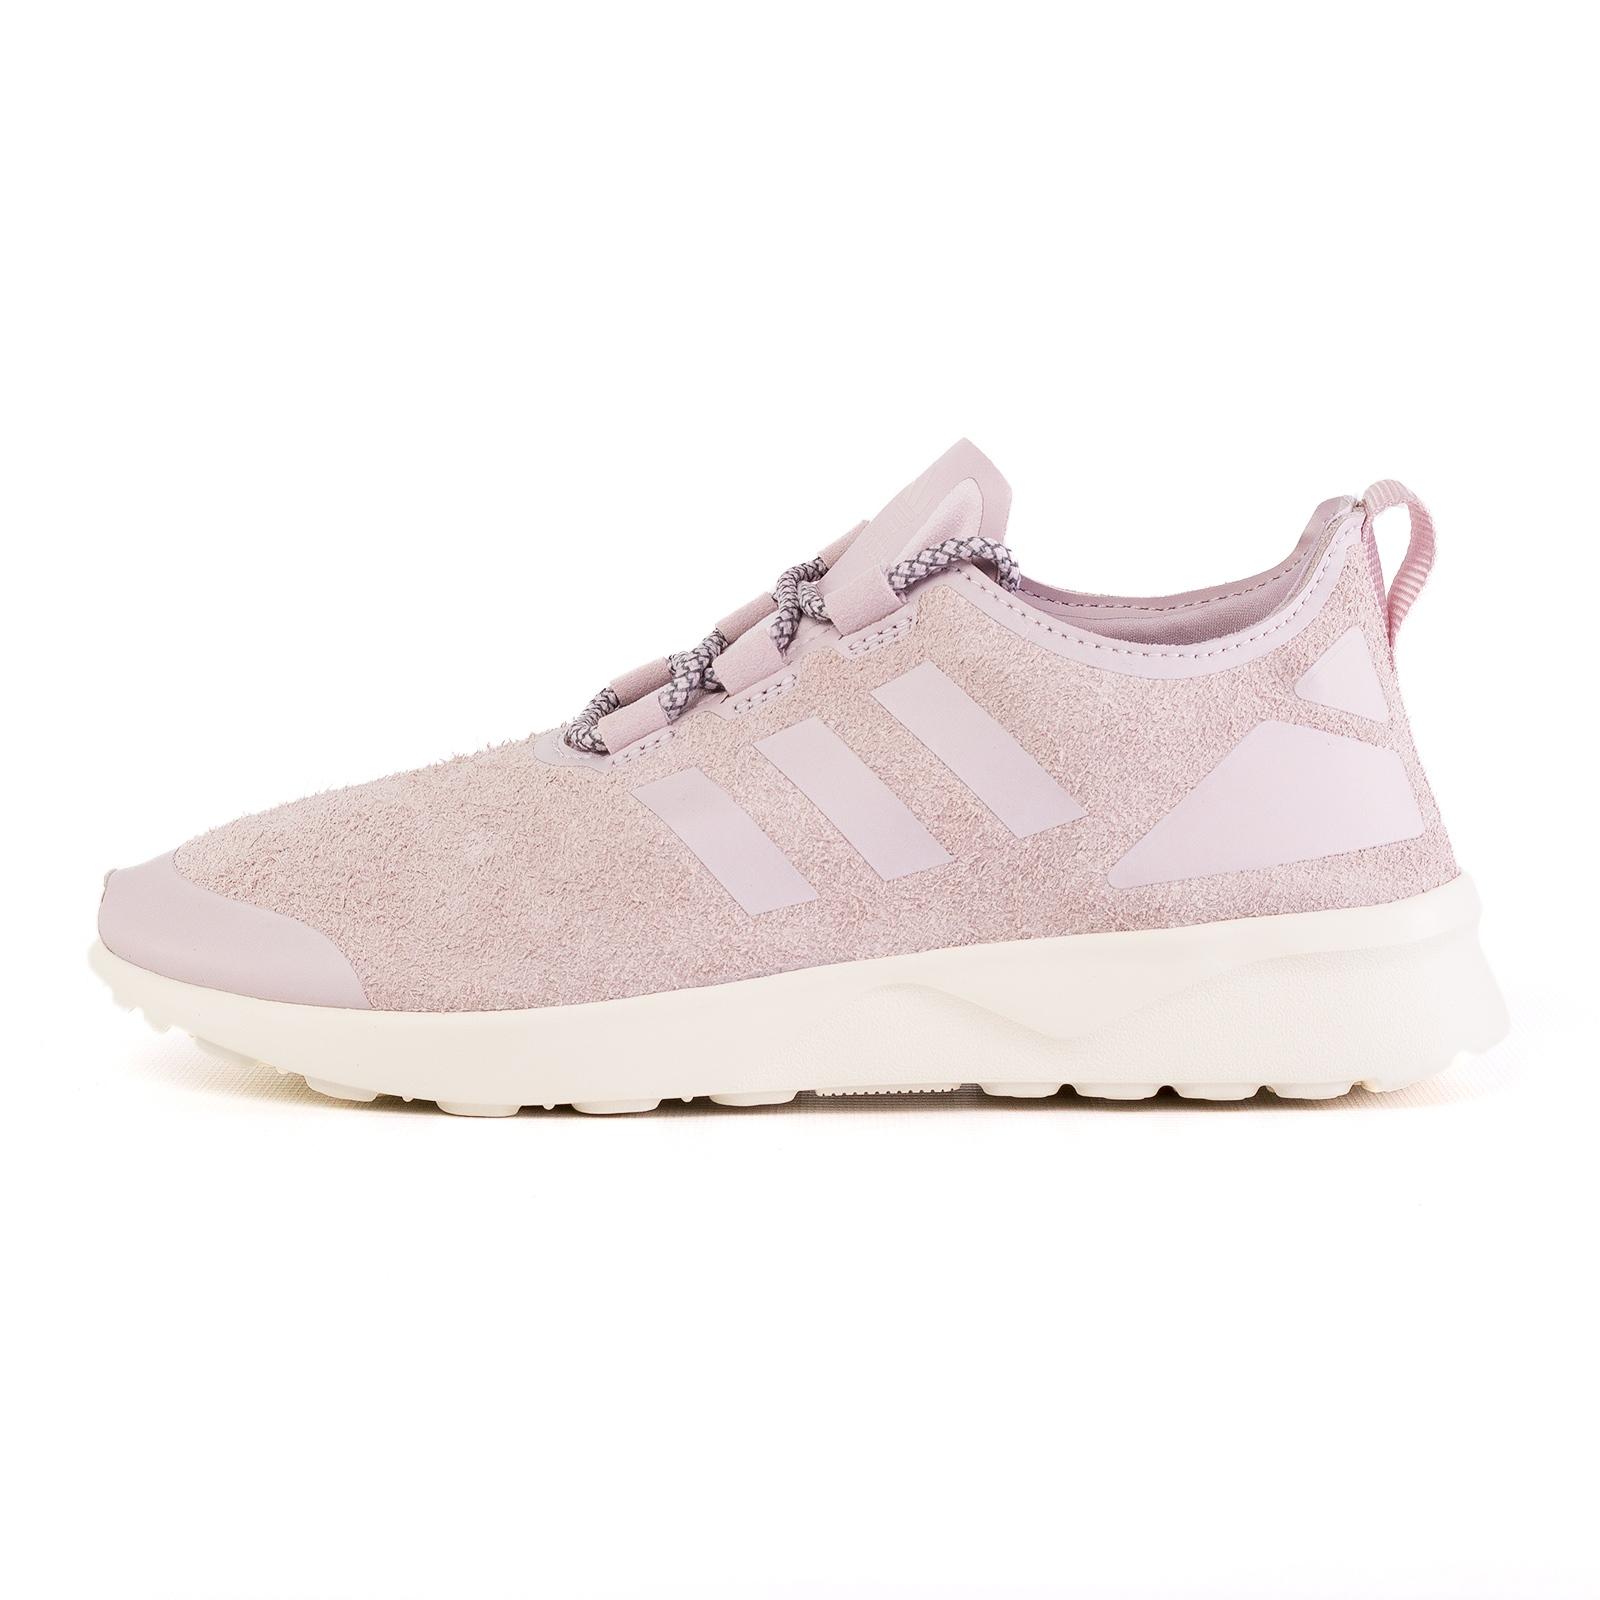 Adidas ZX Flux ADV Verve Damenschuh Sneaker lila 51157